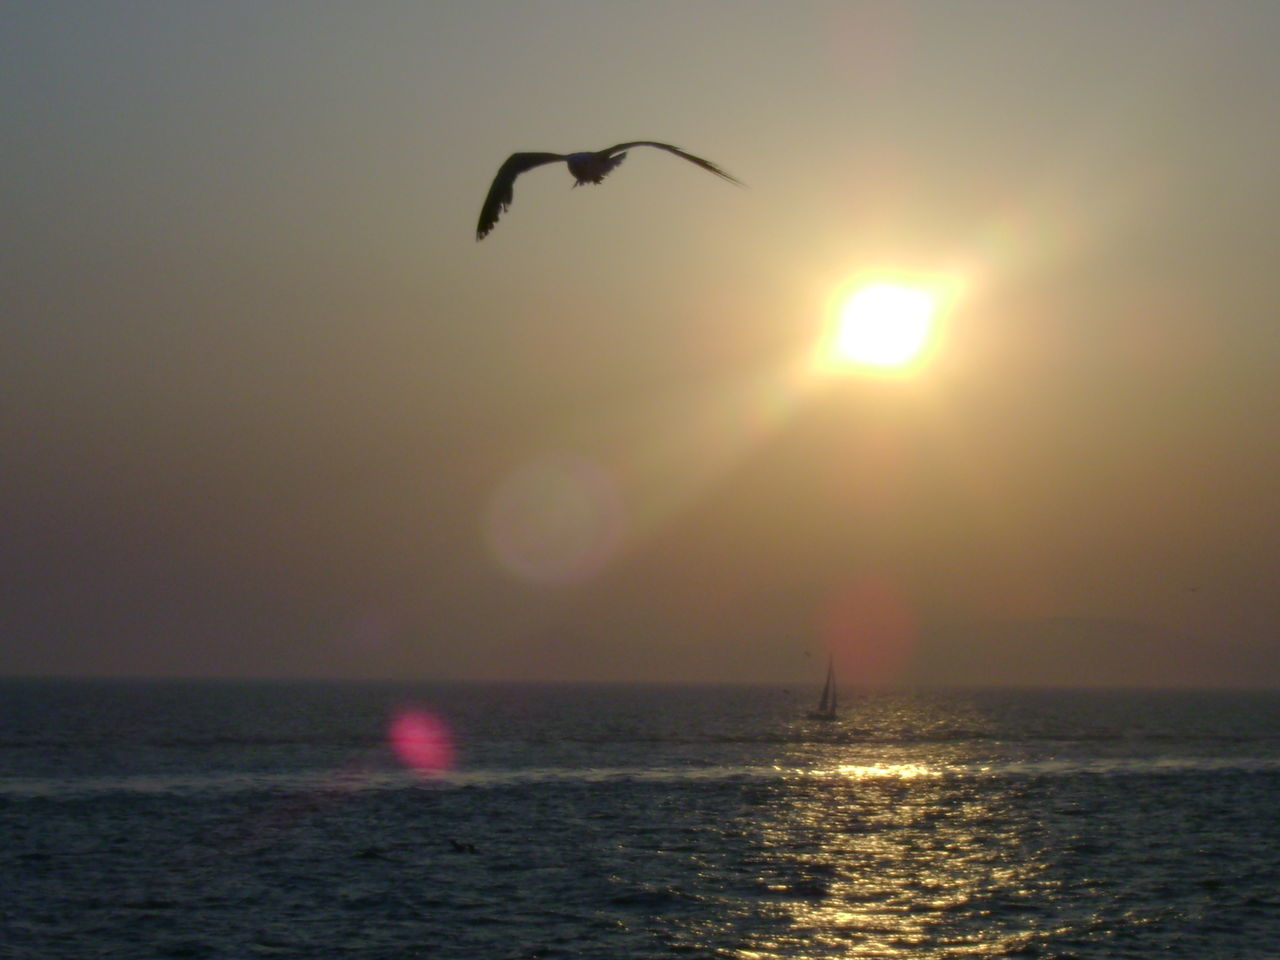 FREEDOM!! Sunset Idyllic Sunlight Horizon Over Water Atmospheric Mood Summer ☀ Sail Away, Sail Away Bird In Flight